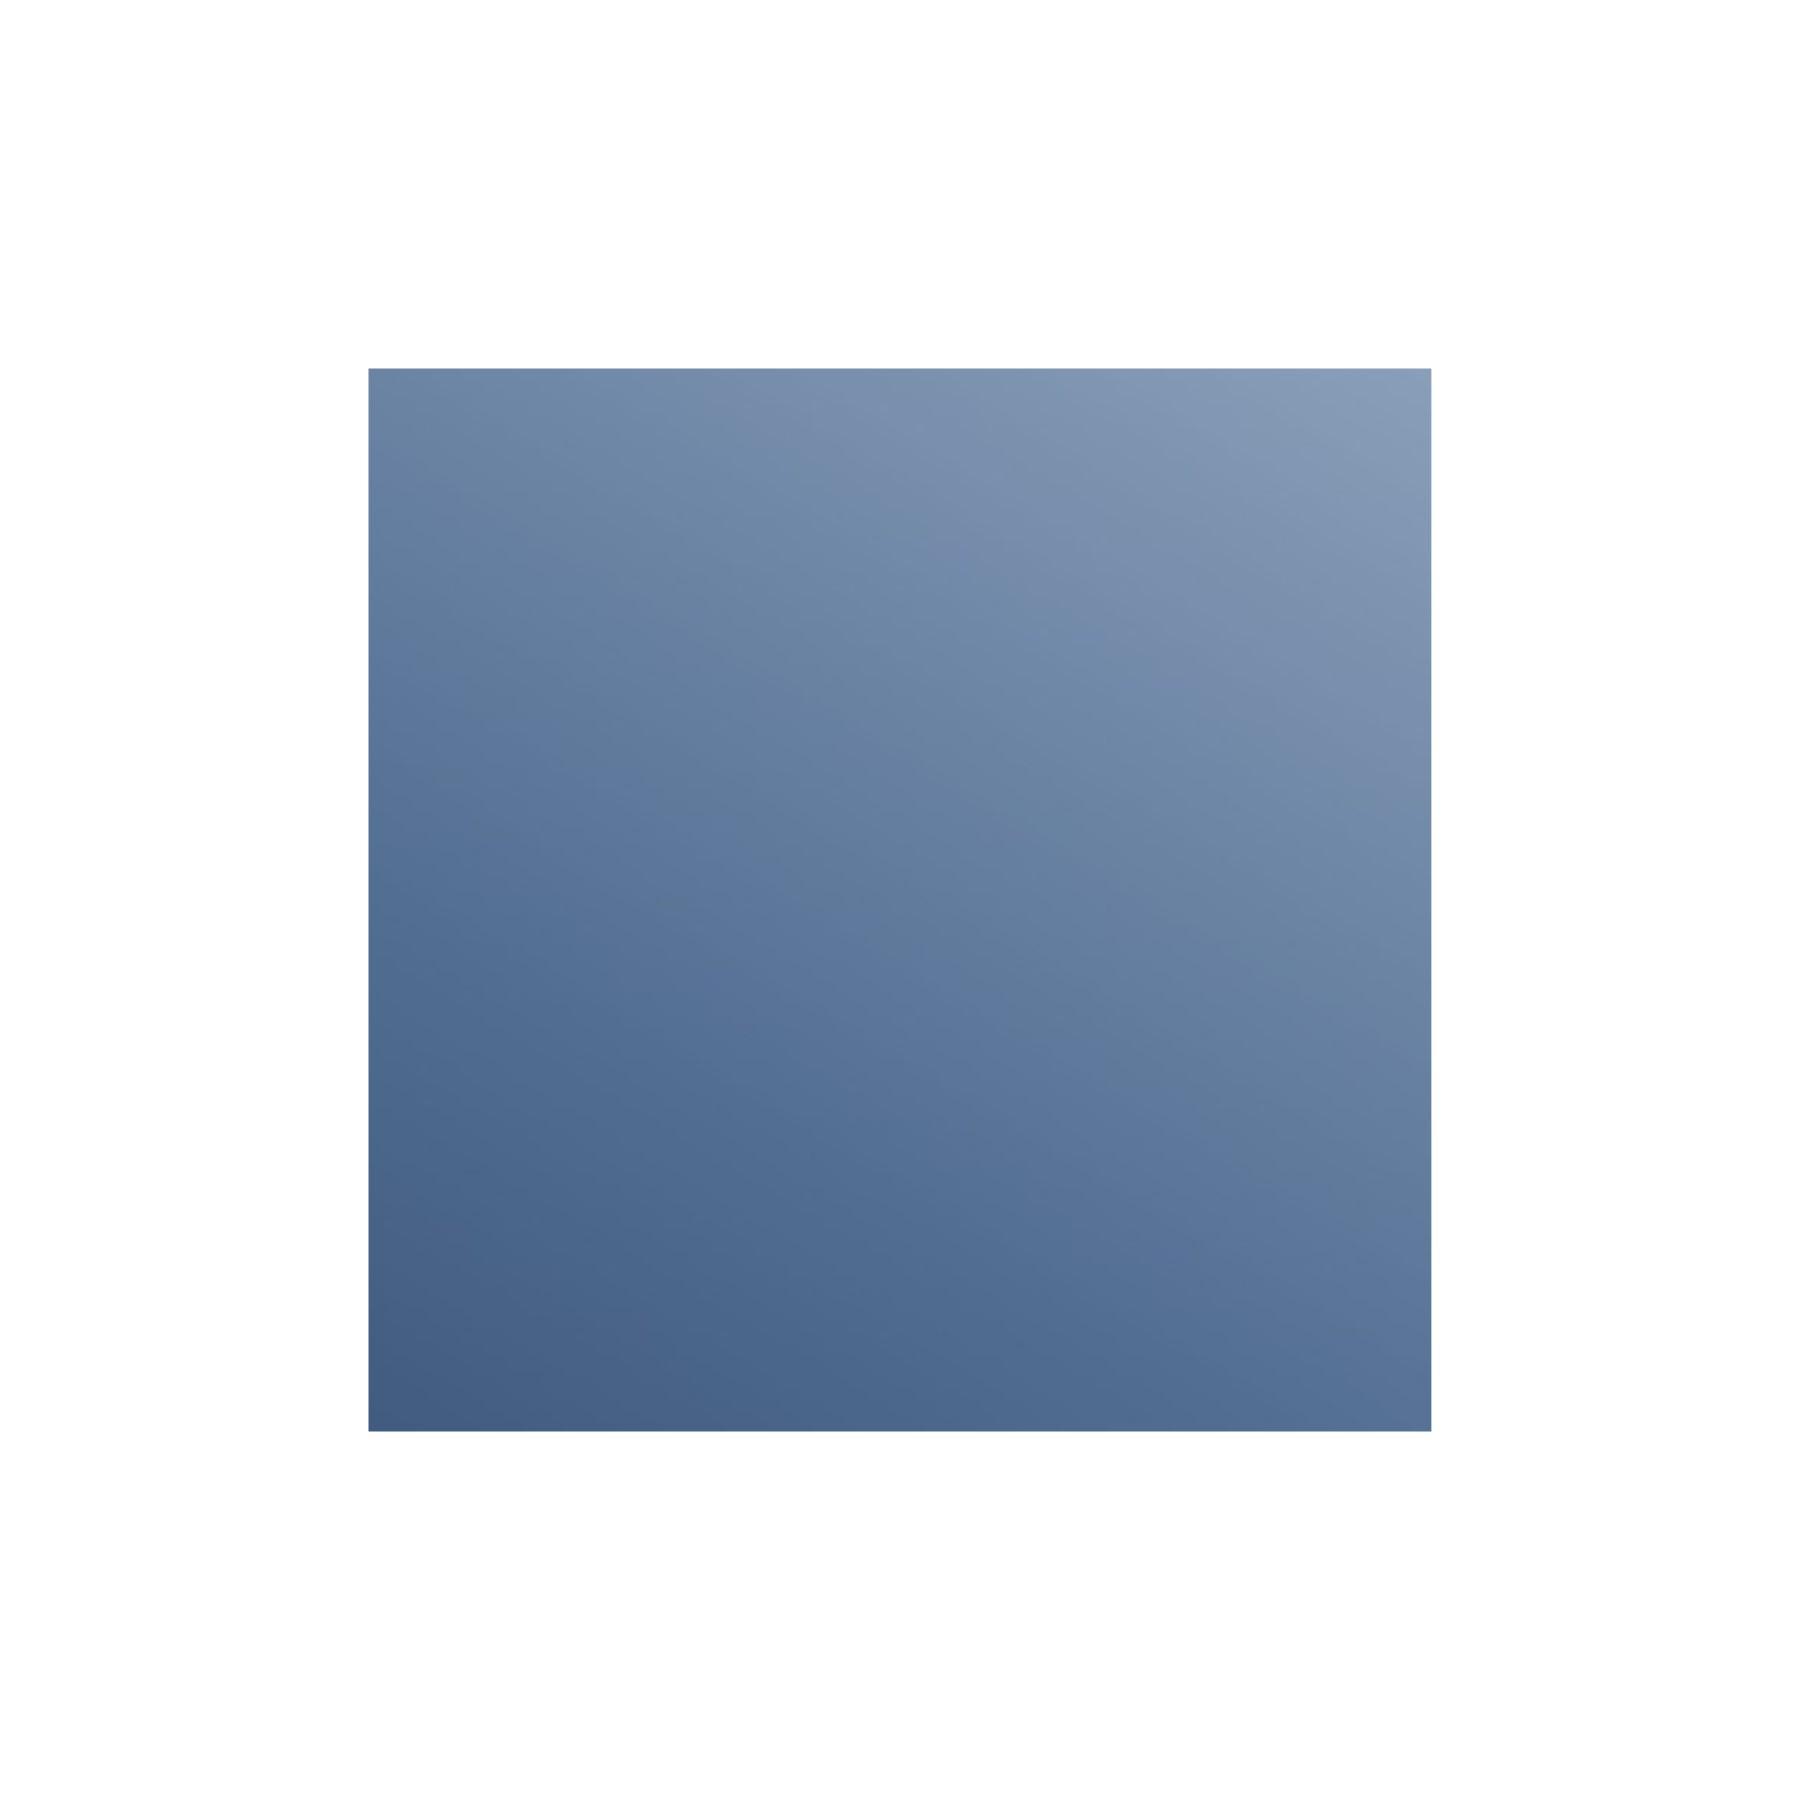 Vinilo textil Easyweed® Electric hoja 30 x 38 cm Azul claro